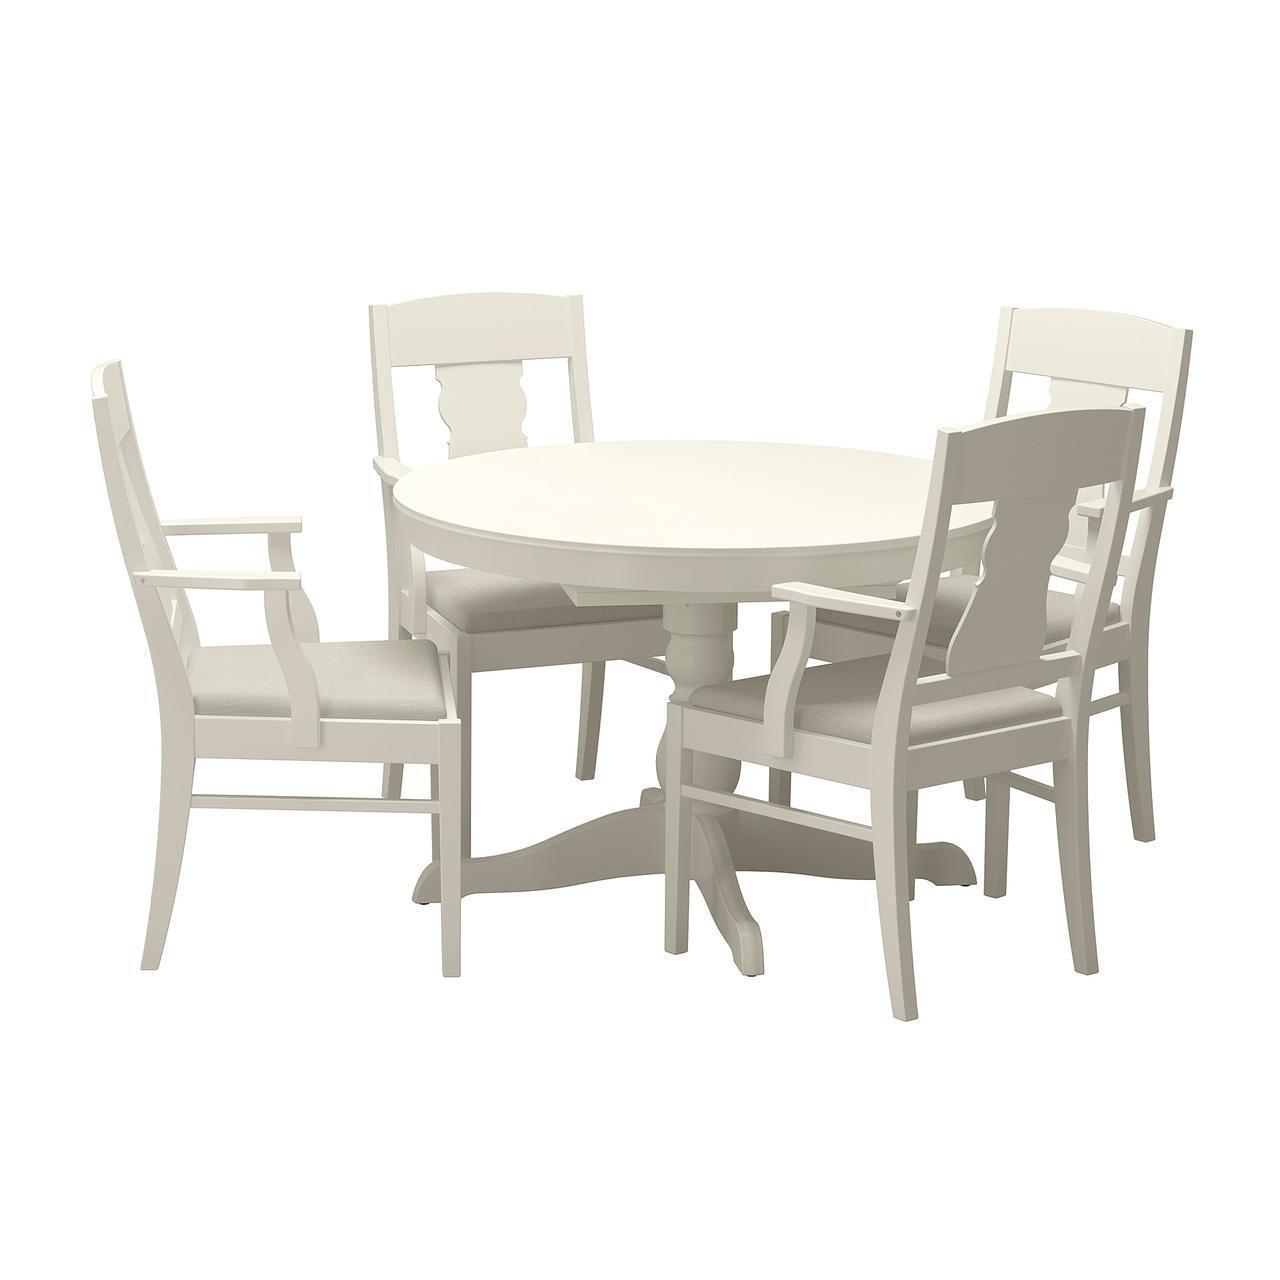 Комплект для кухни (стол и 4 стула) IKEA INGATORP / INGATORP 110/155 см белый 892.522.02